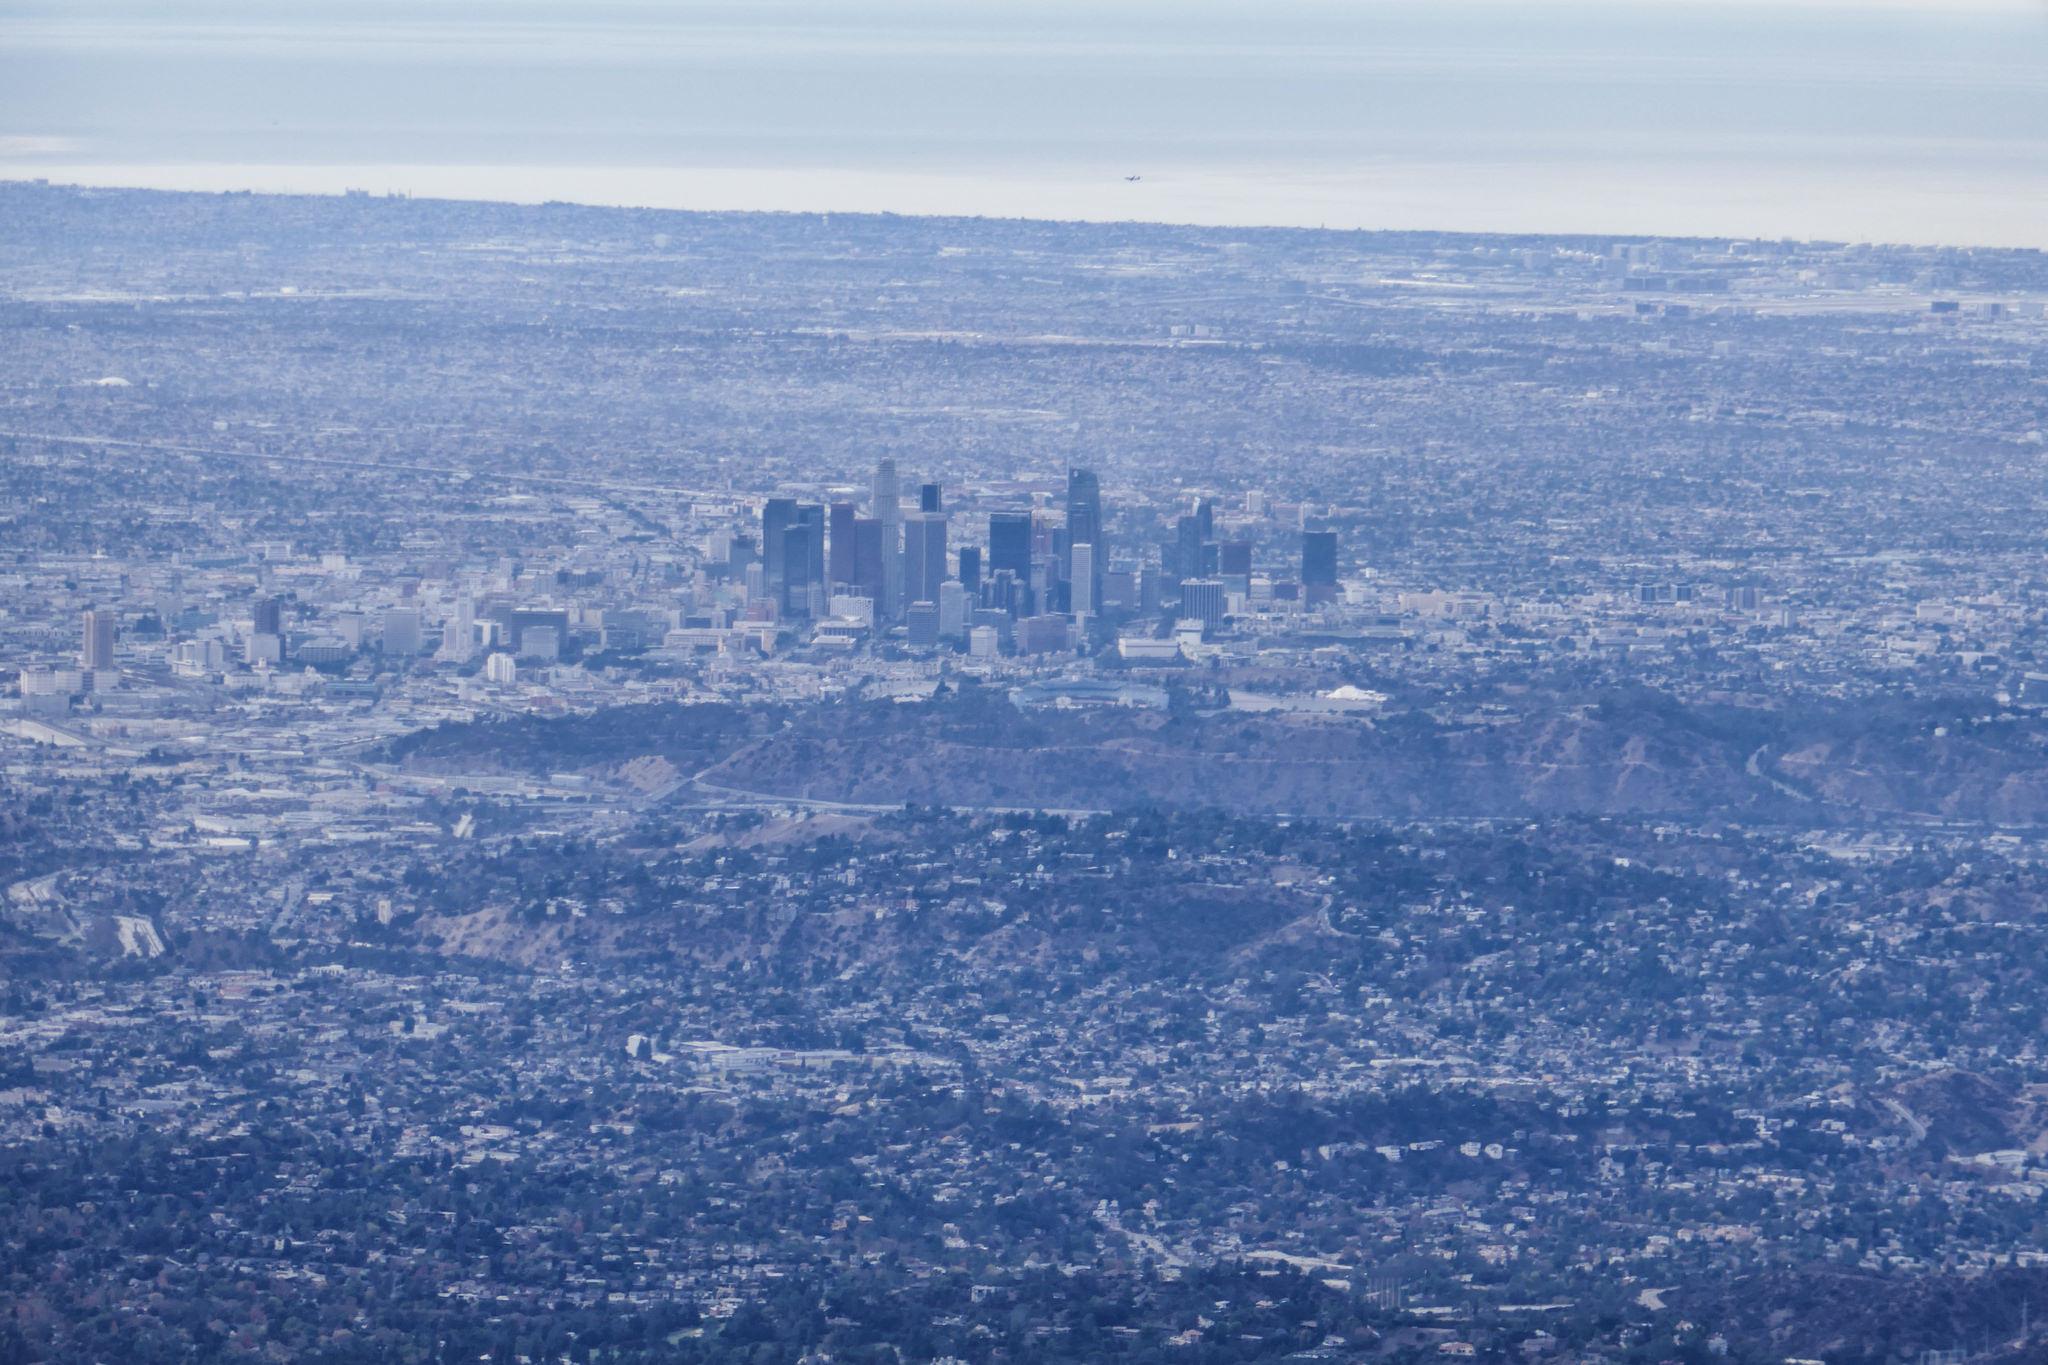 The LA Basin.